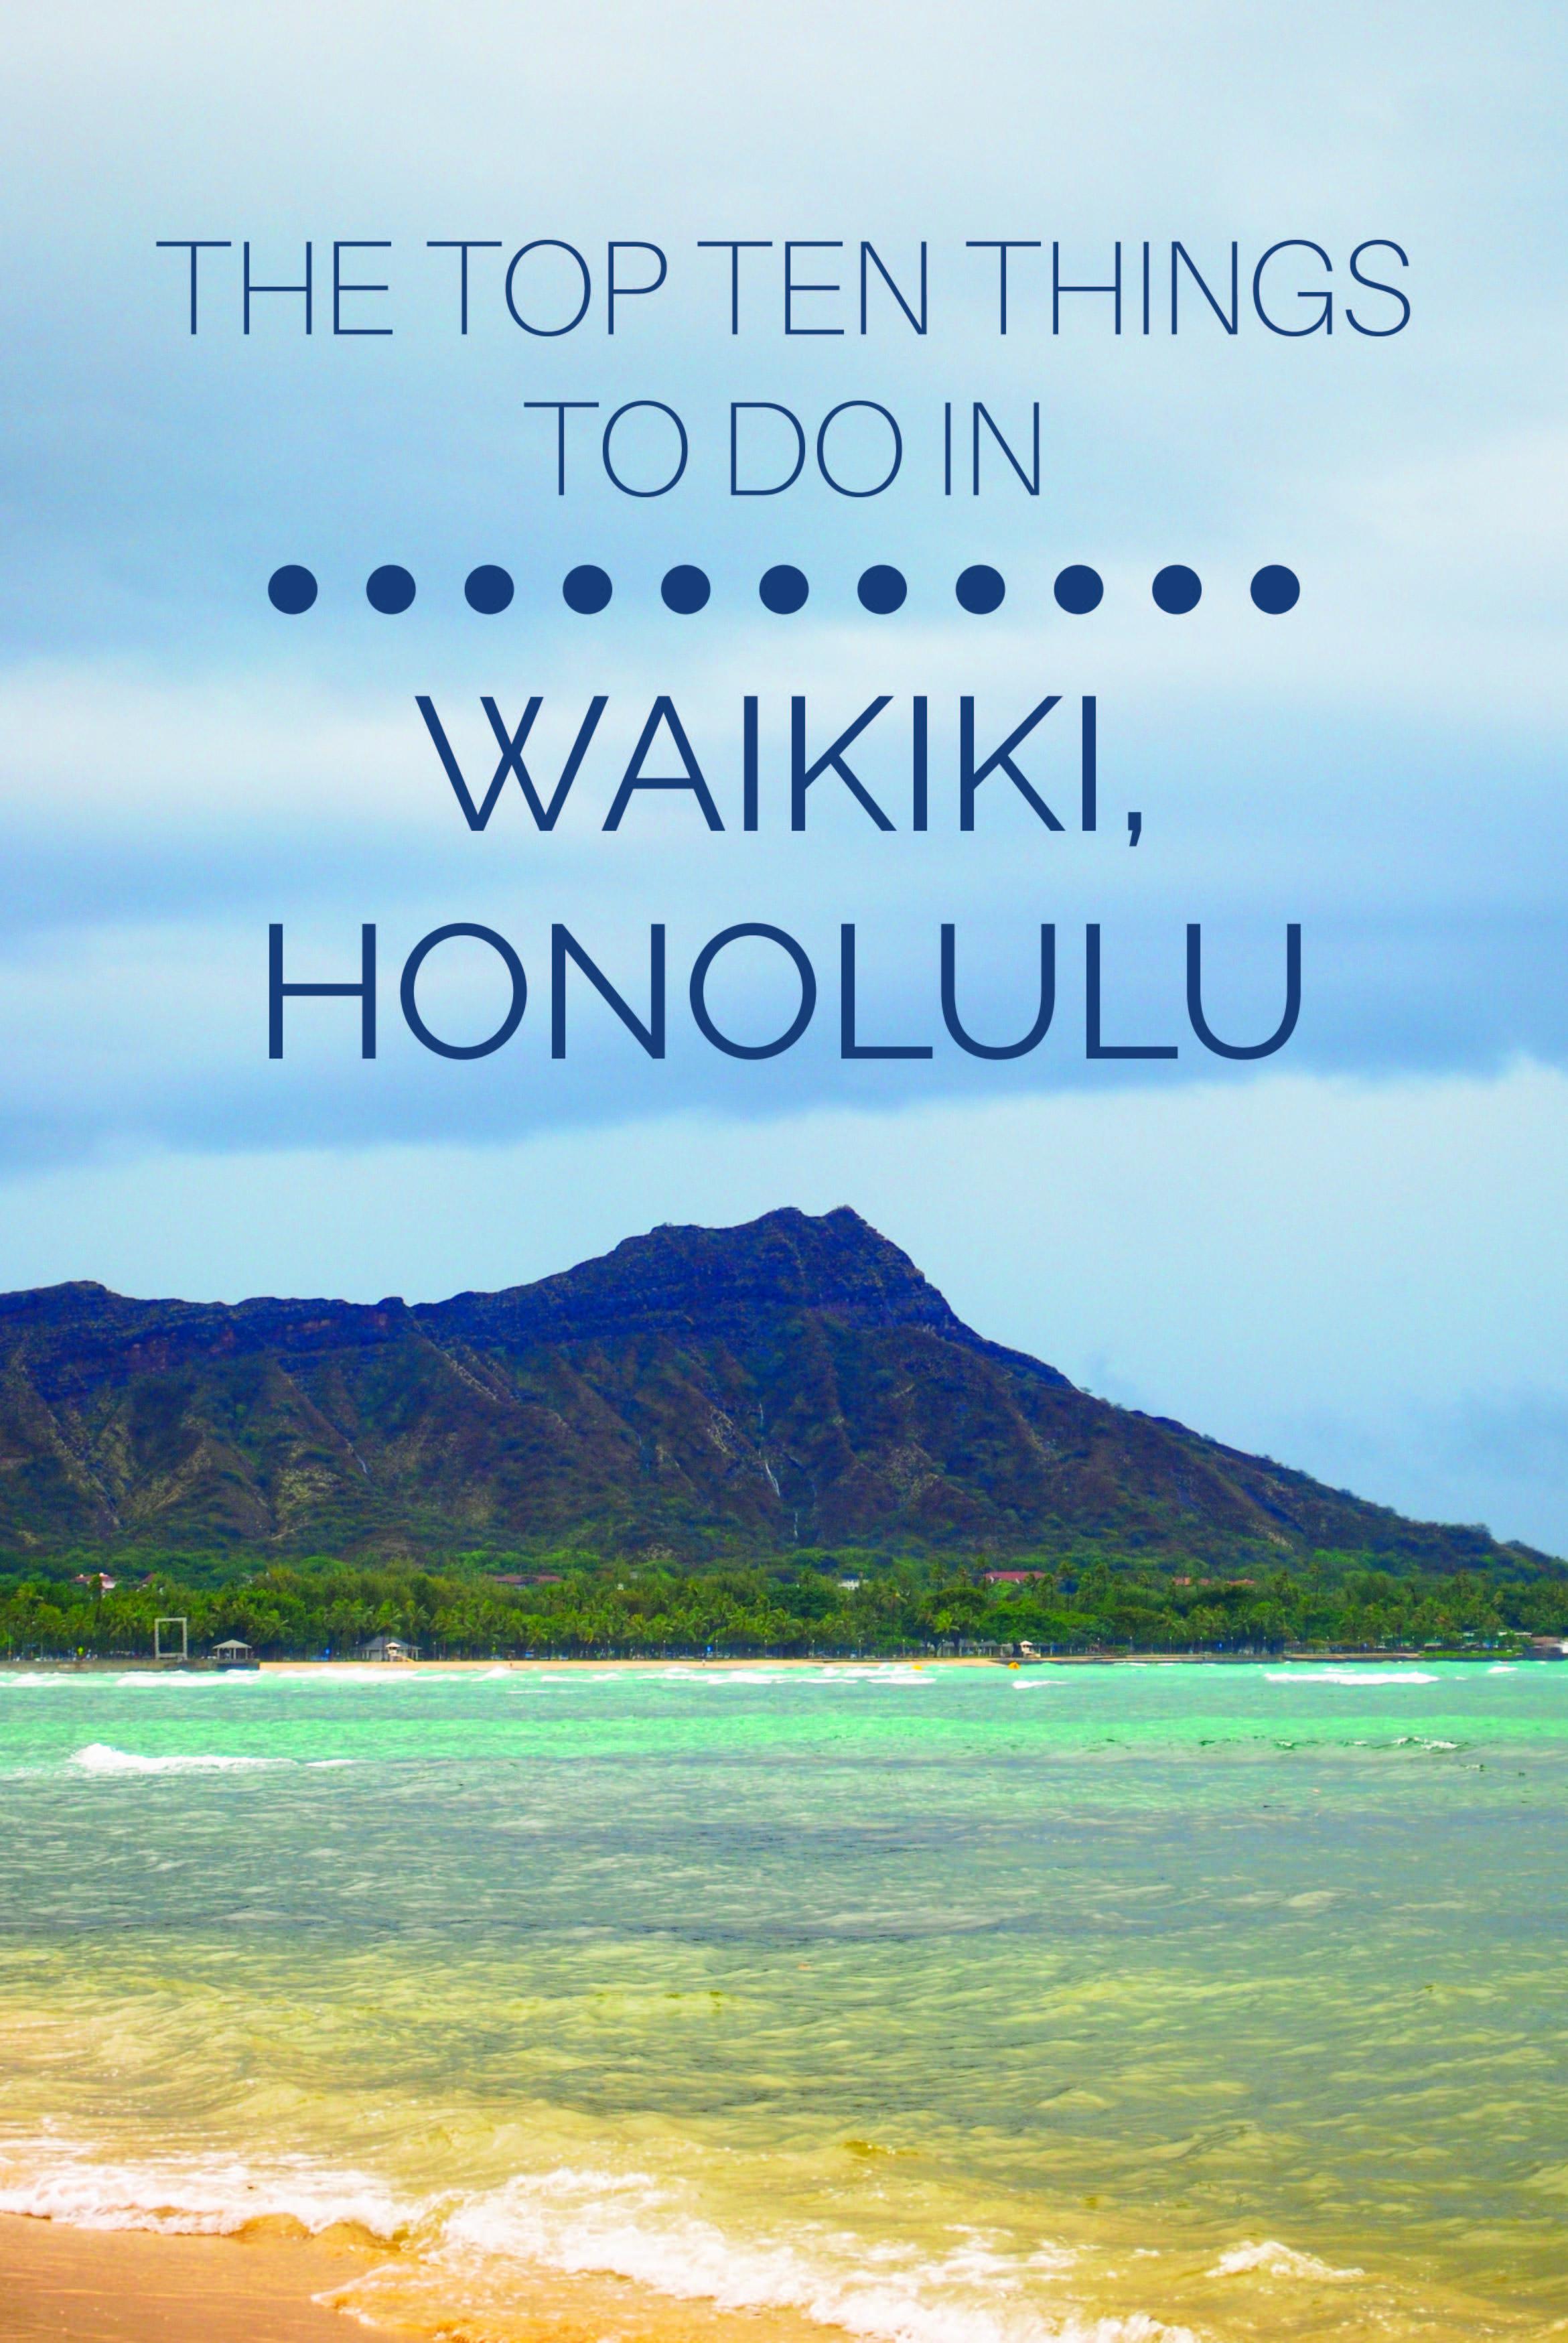 In Waikiki Honolulu Hawaii